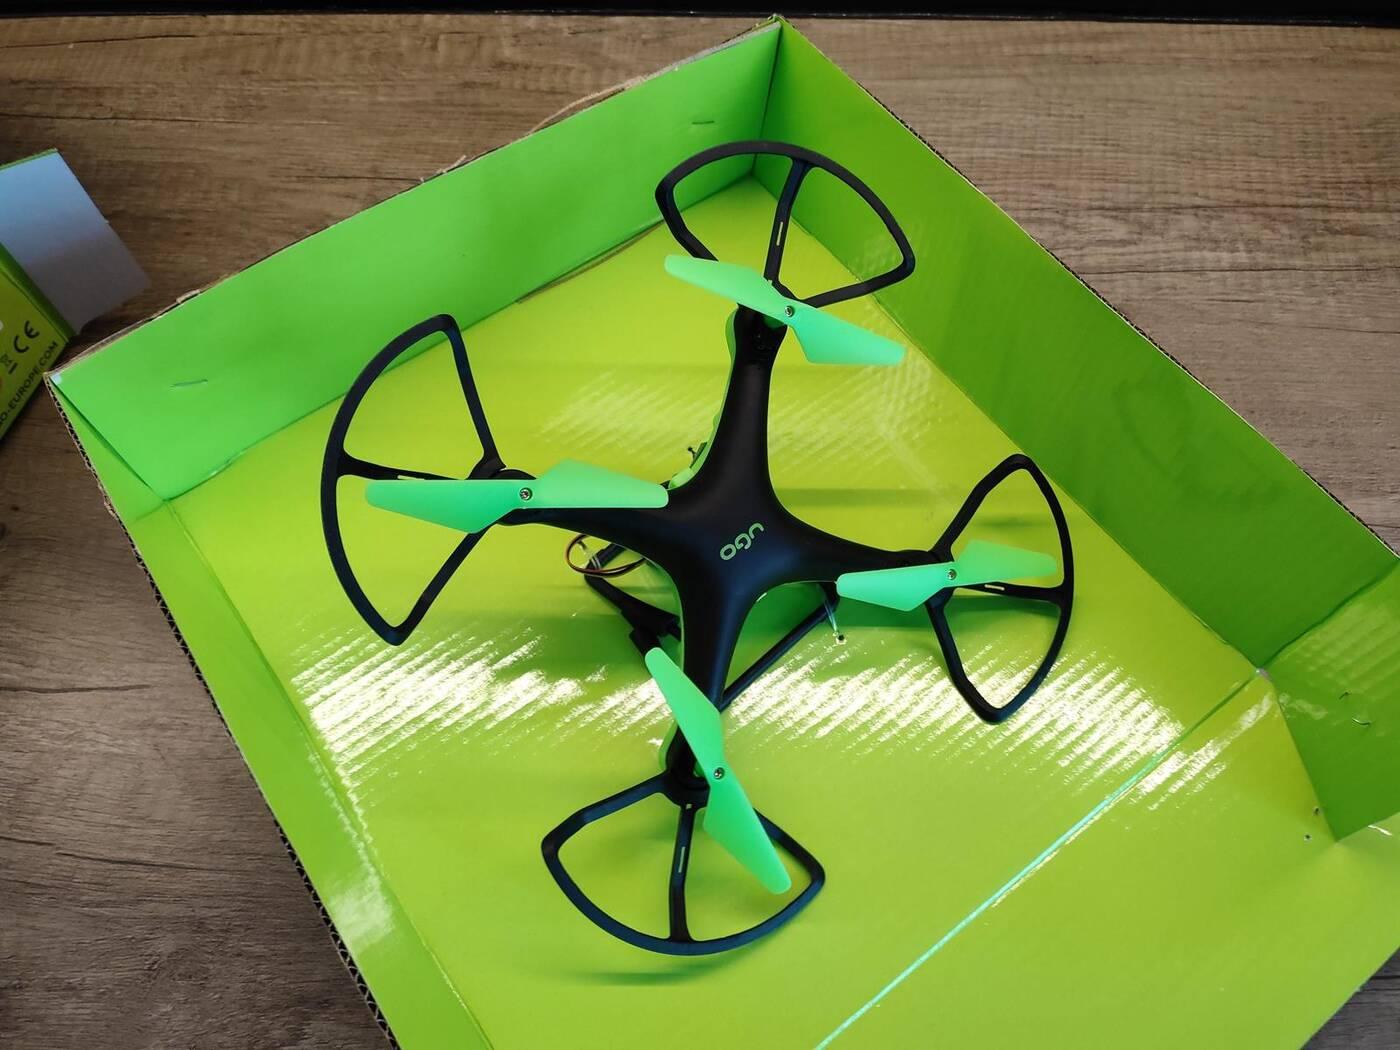 Test drona uGO Fen 2.0, uGO Fen 2.0, dron uGO Fen 2.0, uGO Fen